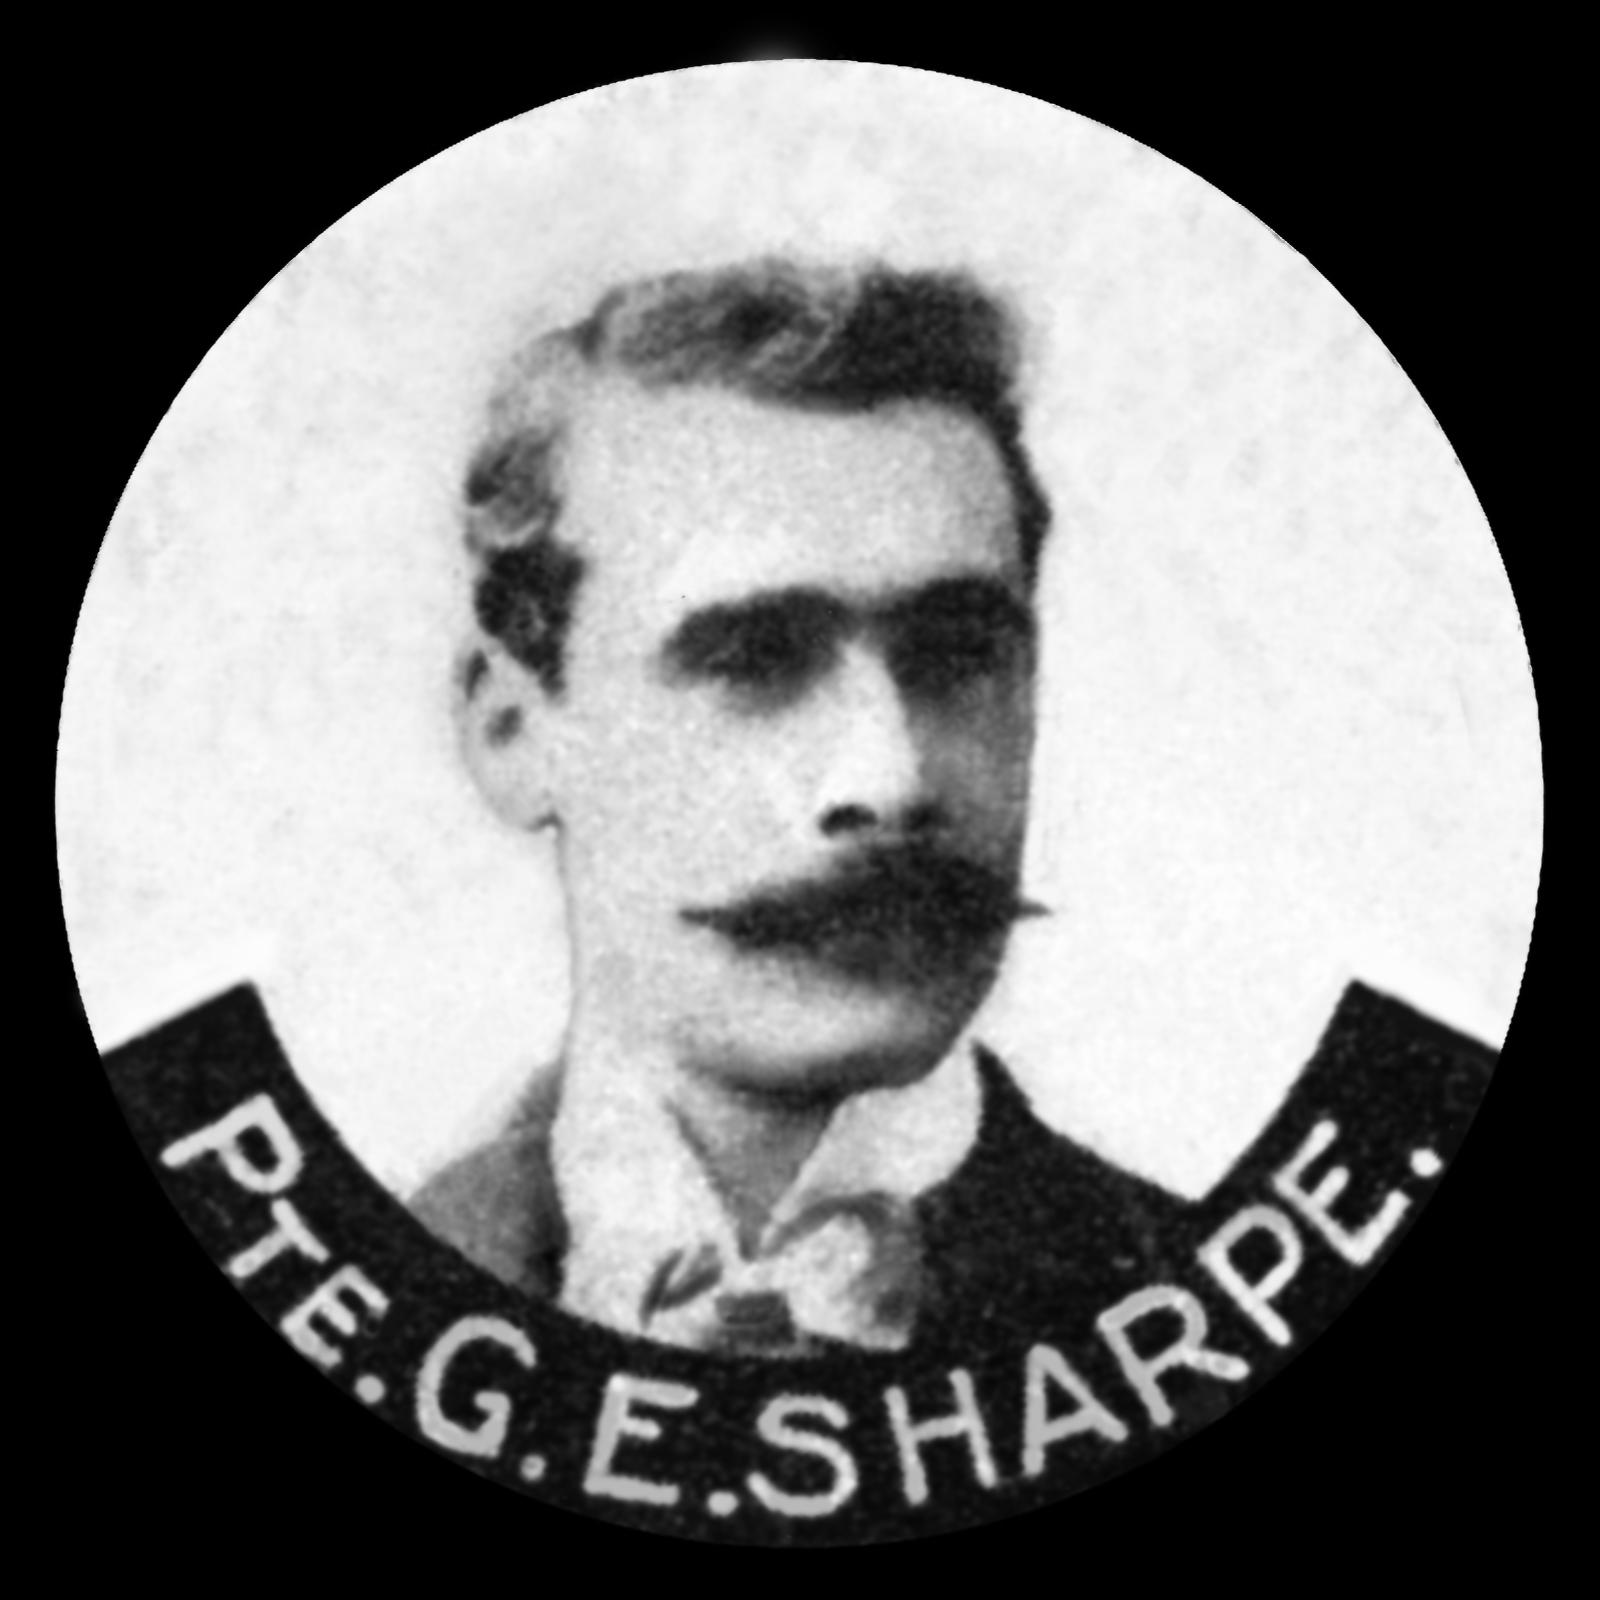 SHARPE George Ernest